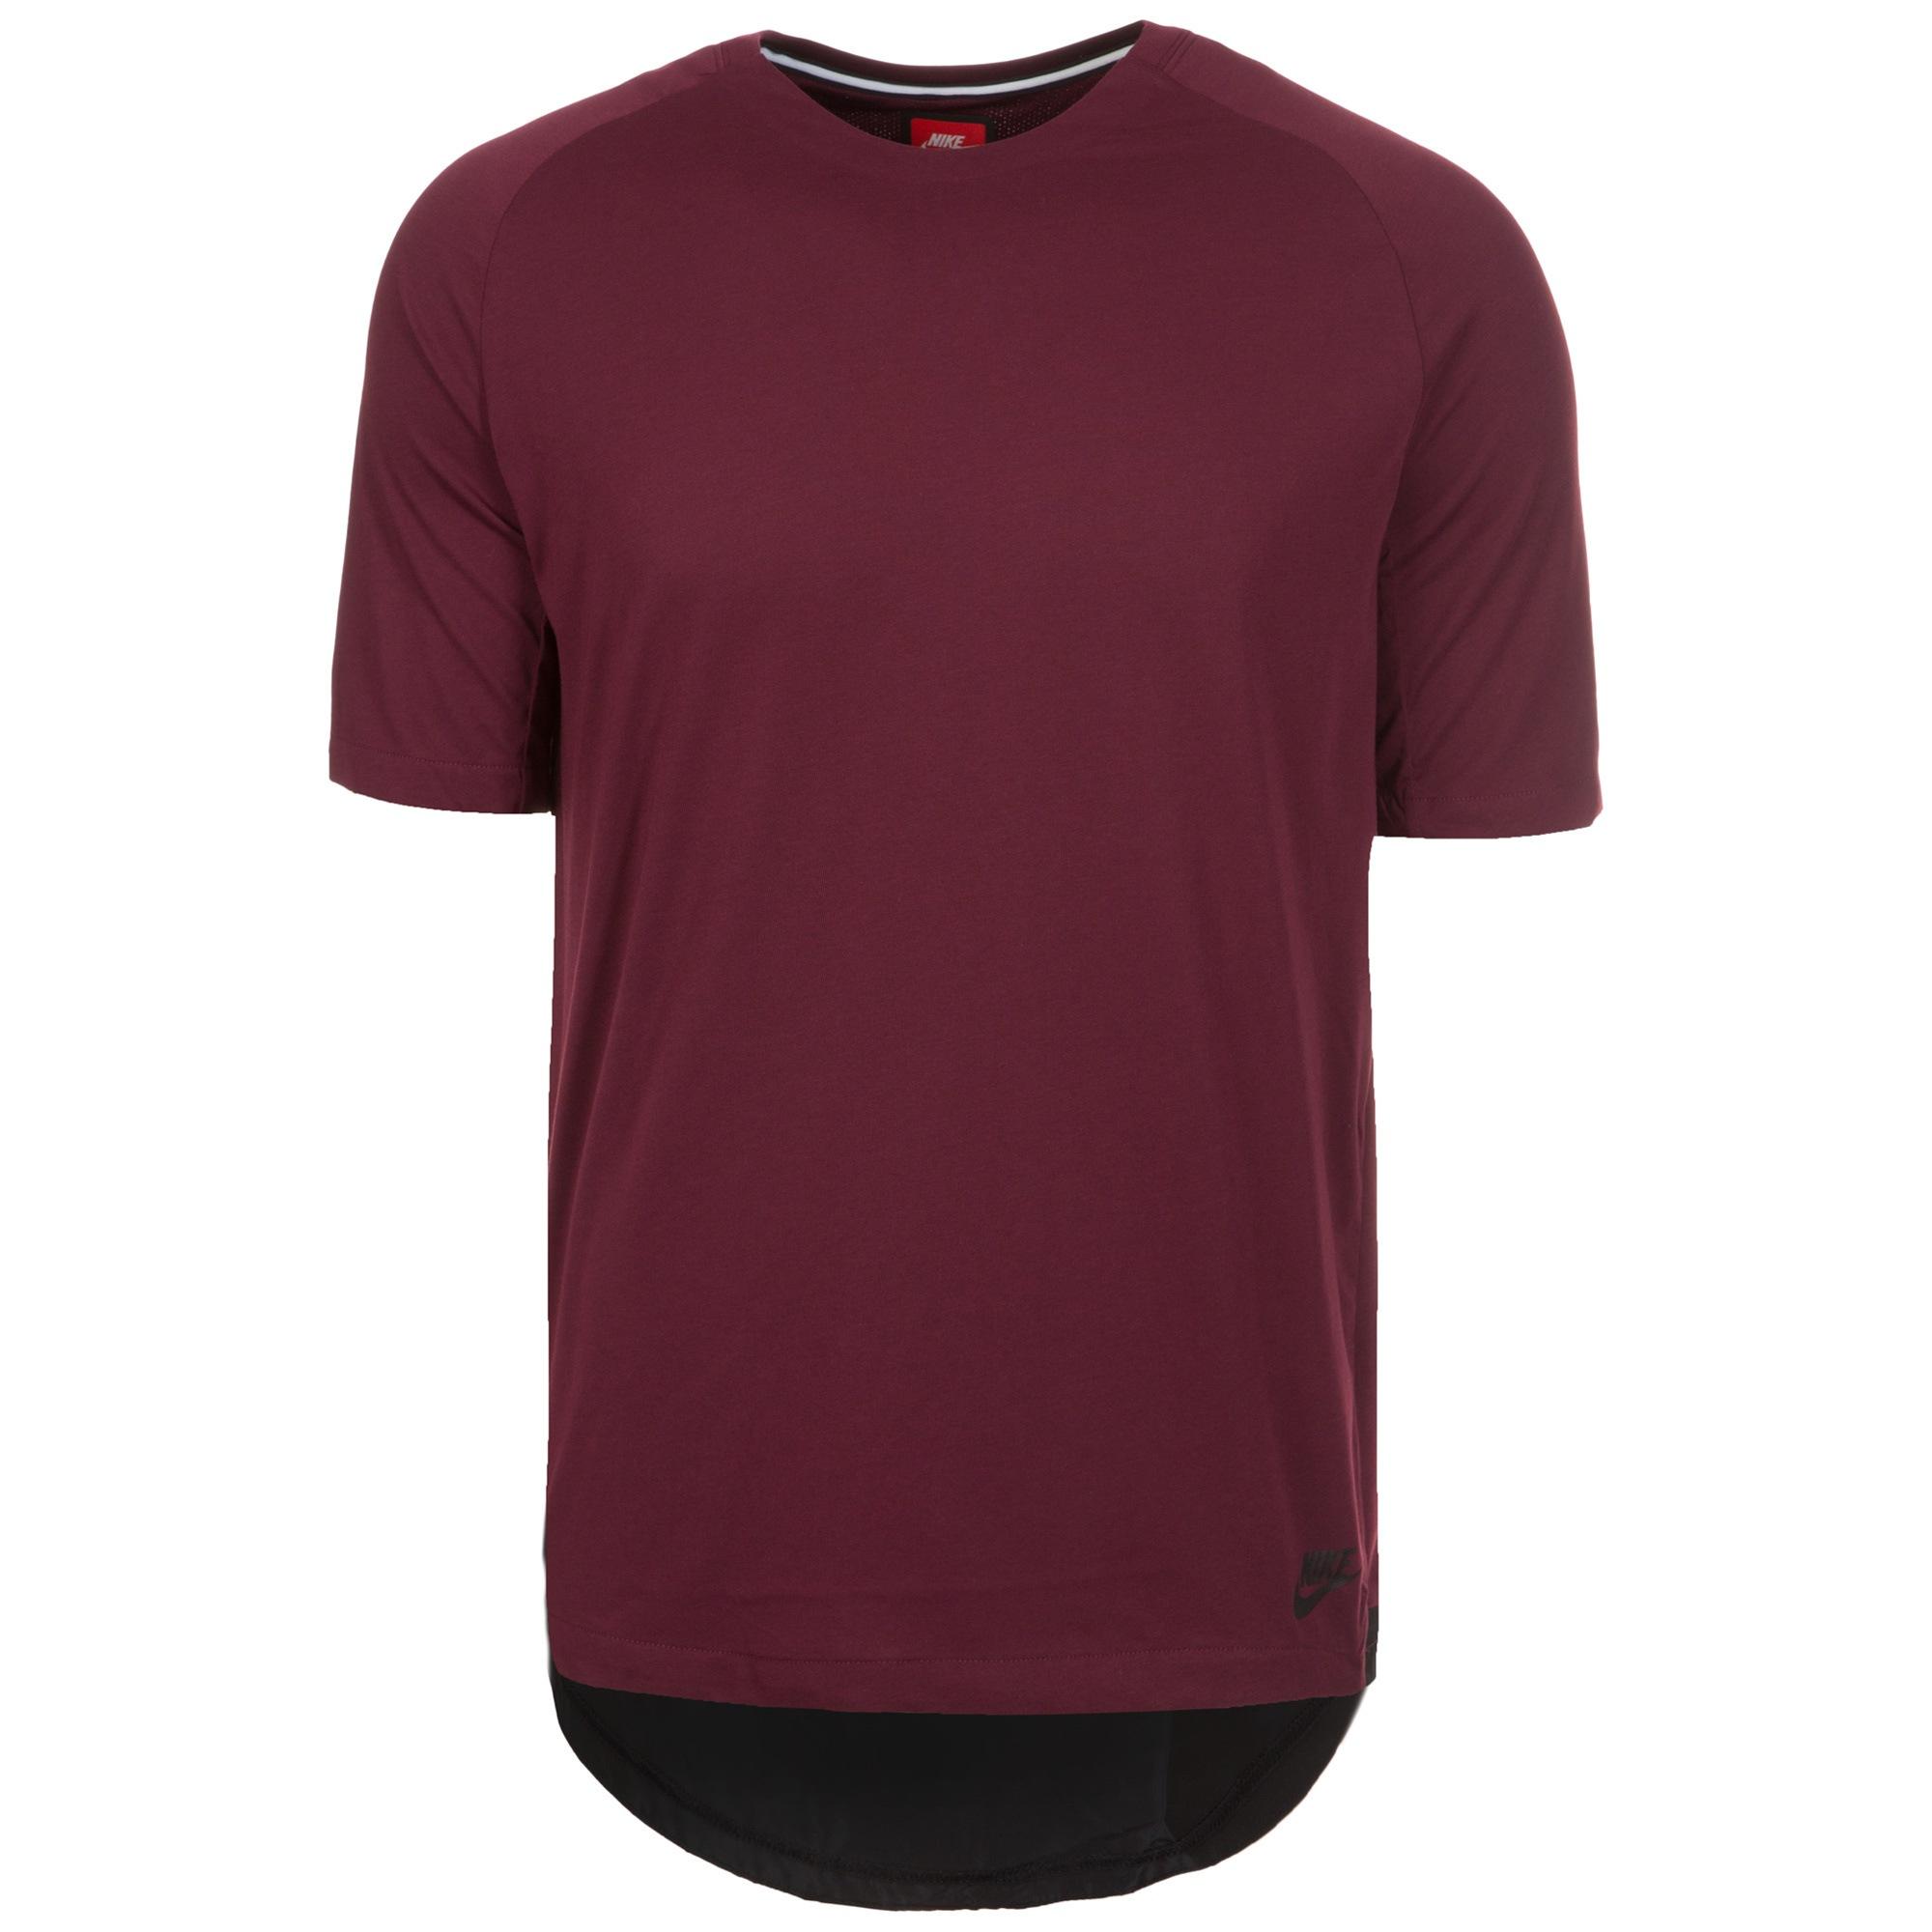 Nike Sportswear Bonded T-Shirt Herren | Sportbekleidung > Sportshirts > Poloshirts | Rot | Polyester - Baumwolle | NIKE SPORTSWEAR